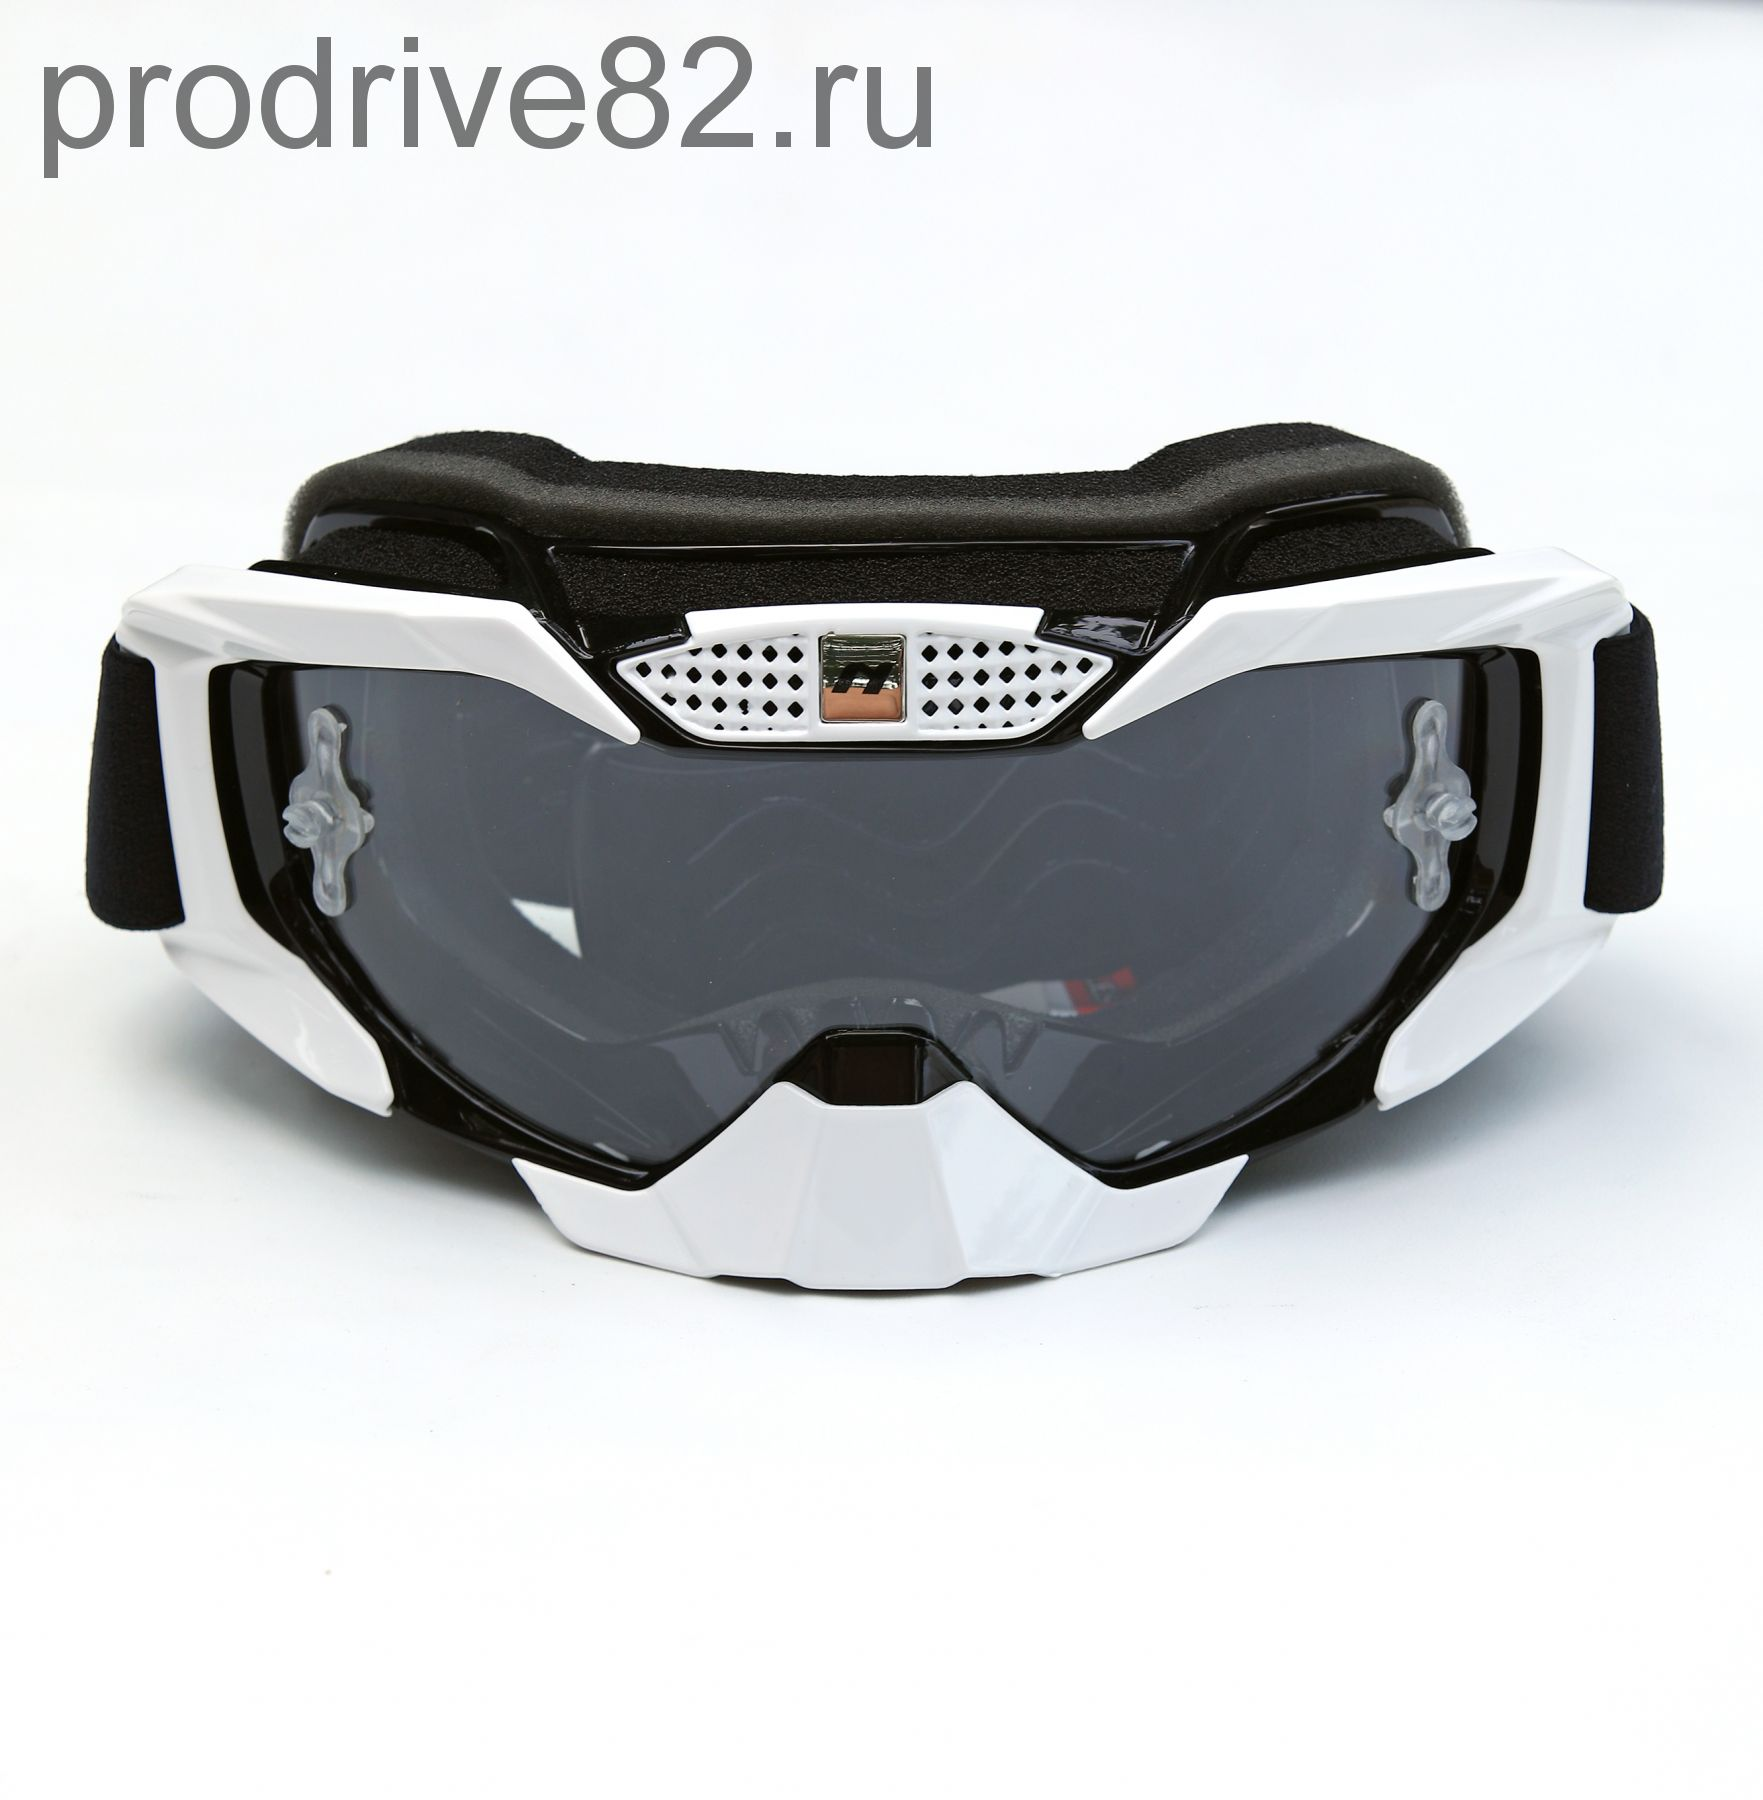 Очки для мотоциклистов NENKI белые